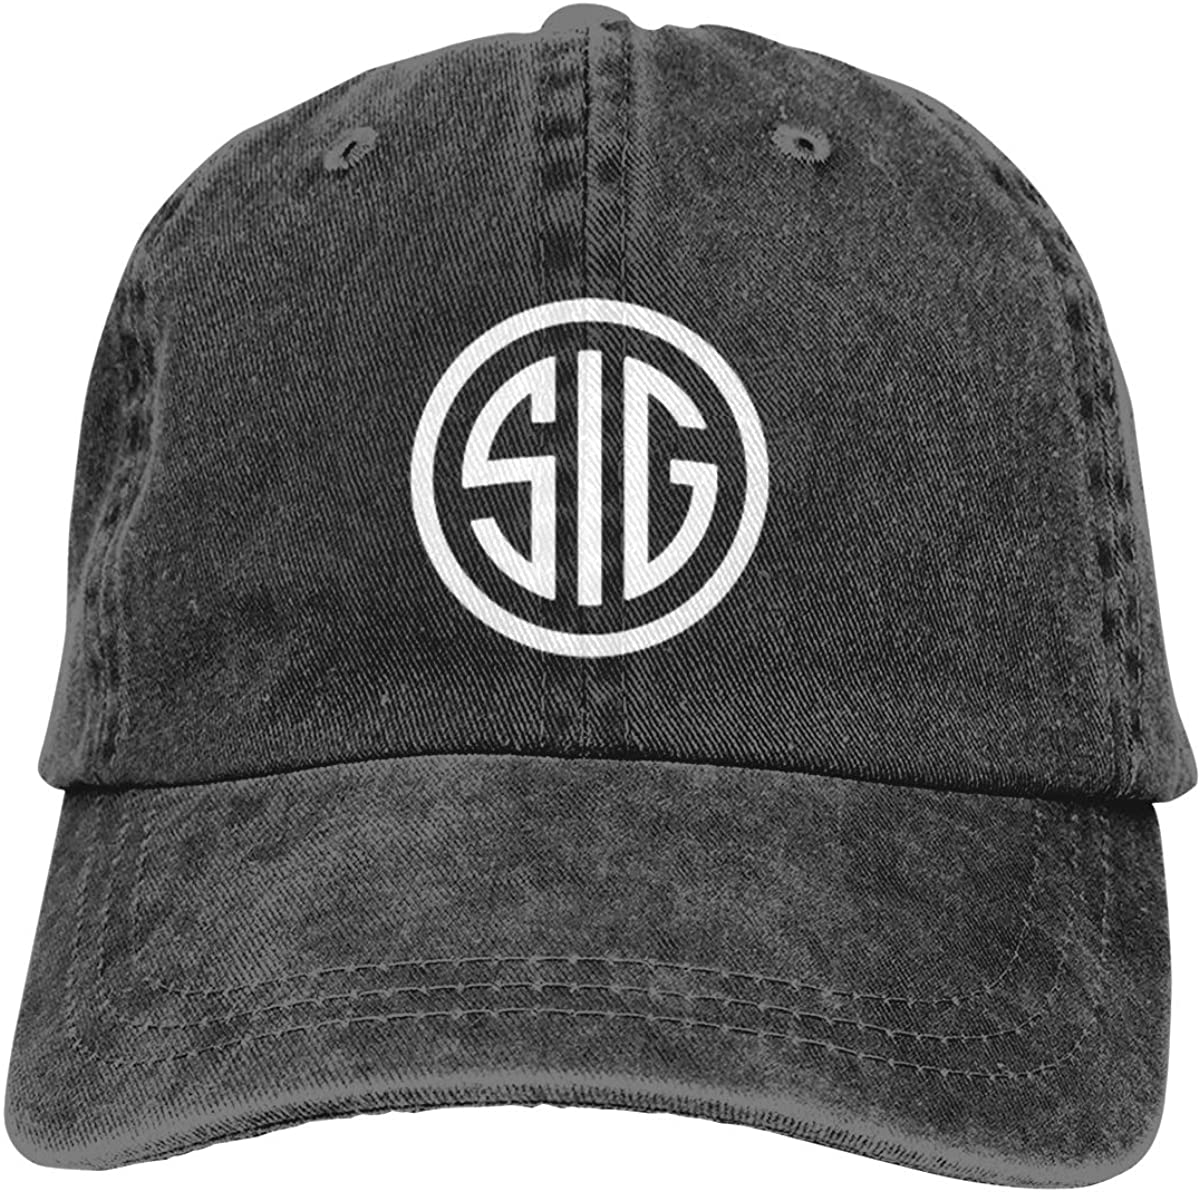 MANDUCK Unisex SIG Logo Retro Cowboy Hat Sports Baseball Cap Adjustable Classic Cotton Adult Hats for Mans Womens